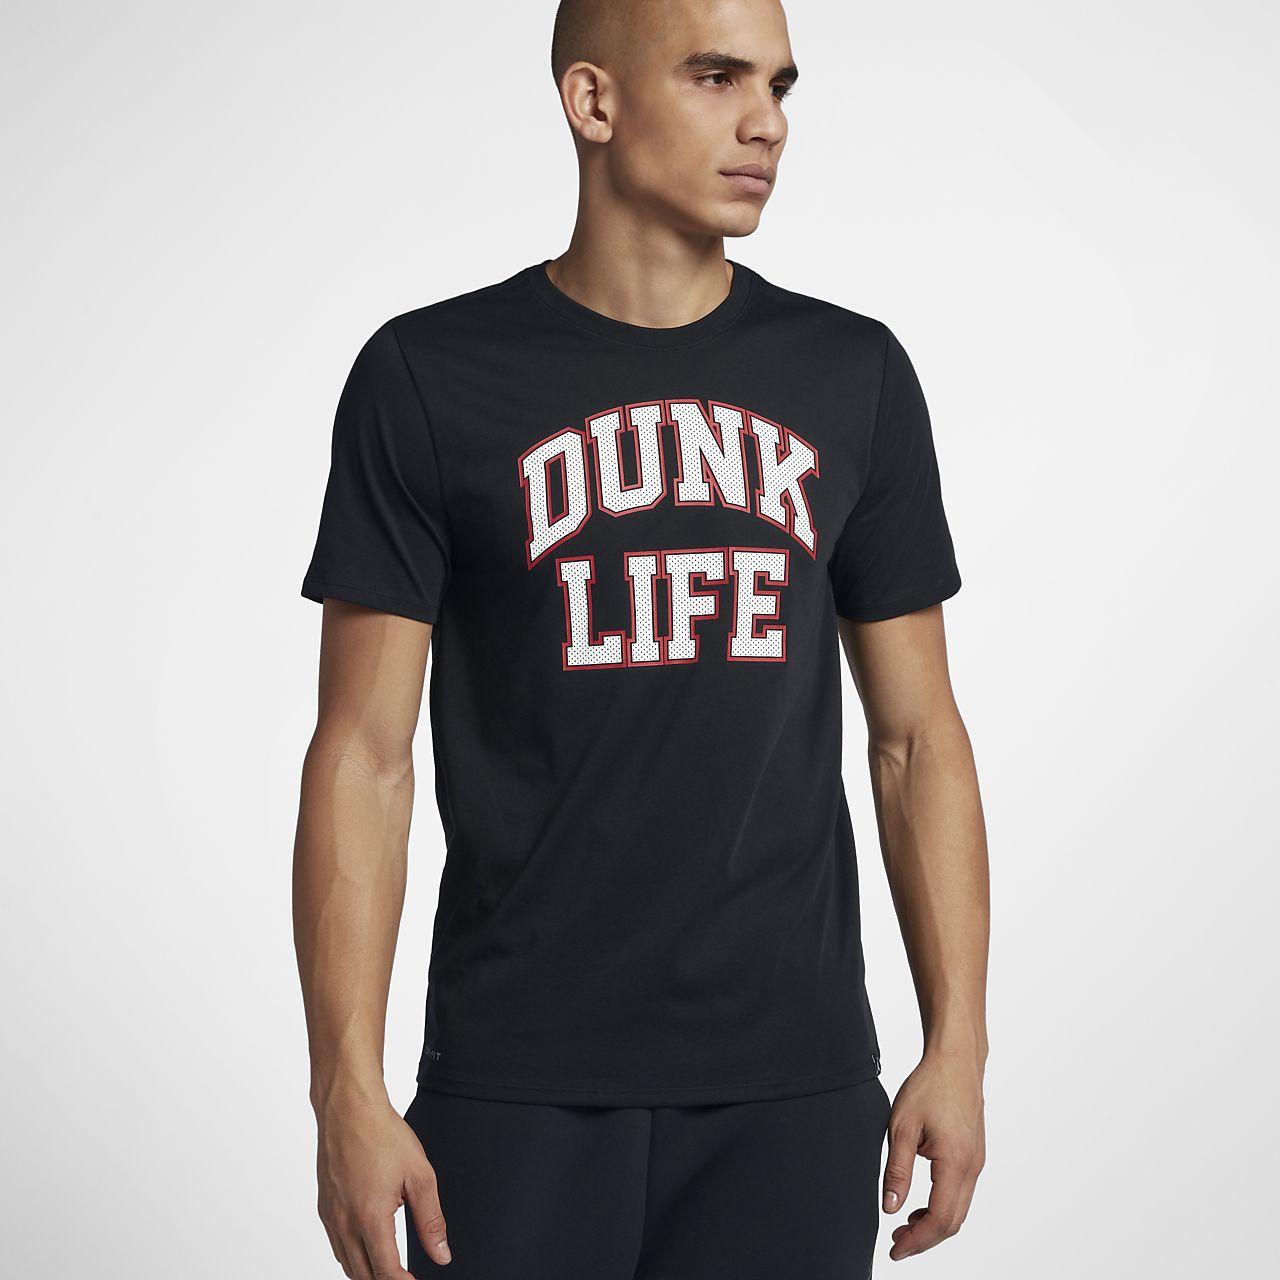 » Dunk Jordan Tee Basketball « Shirt Wfnp7oqxp Homme Pour Life Ca Rise n08wOPk